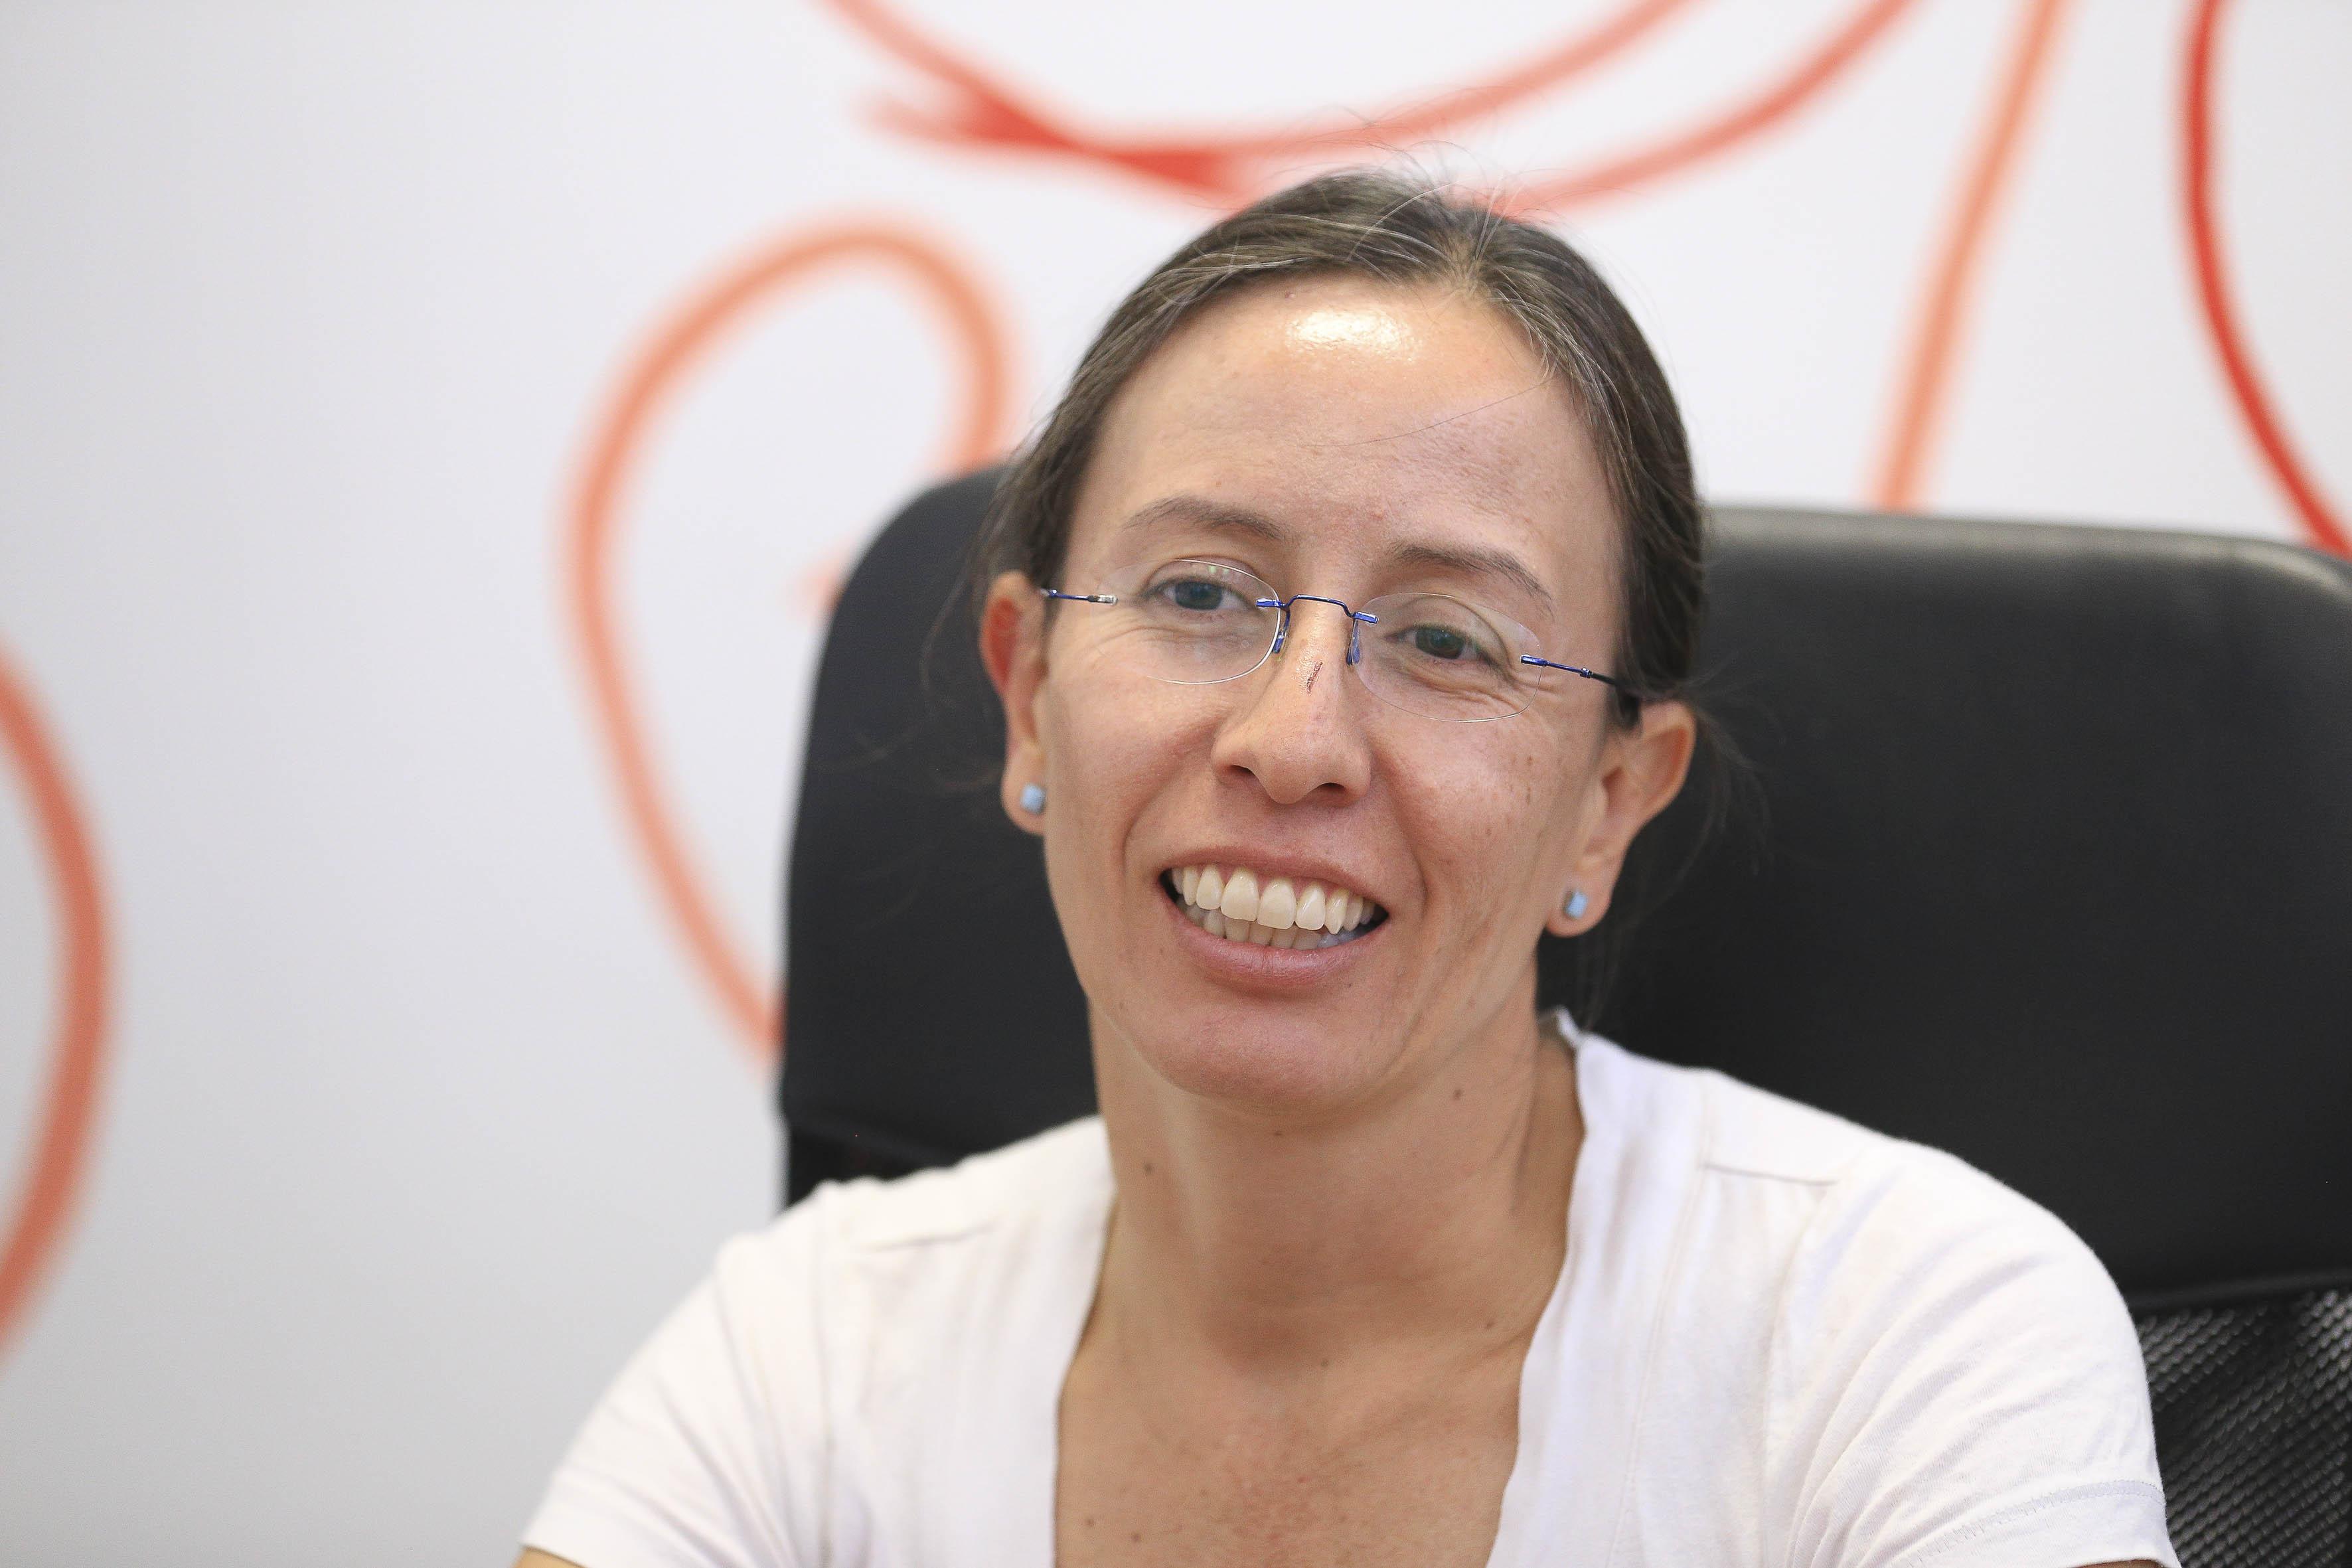 Dra. Ana Sandoval Rodríguez consultora internacional en Lactancia Materna